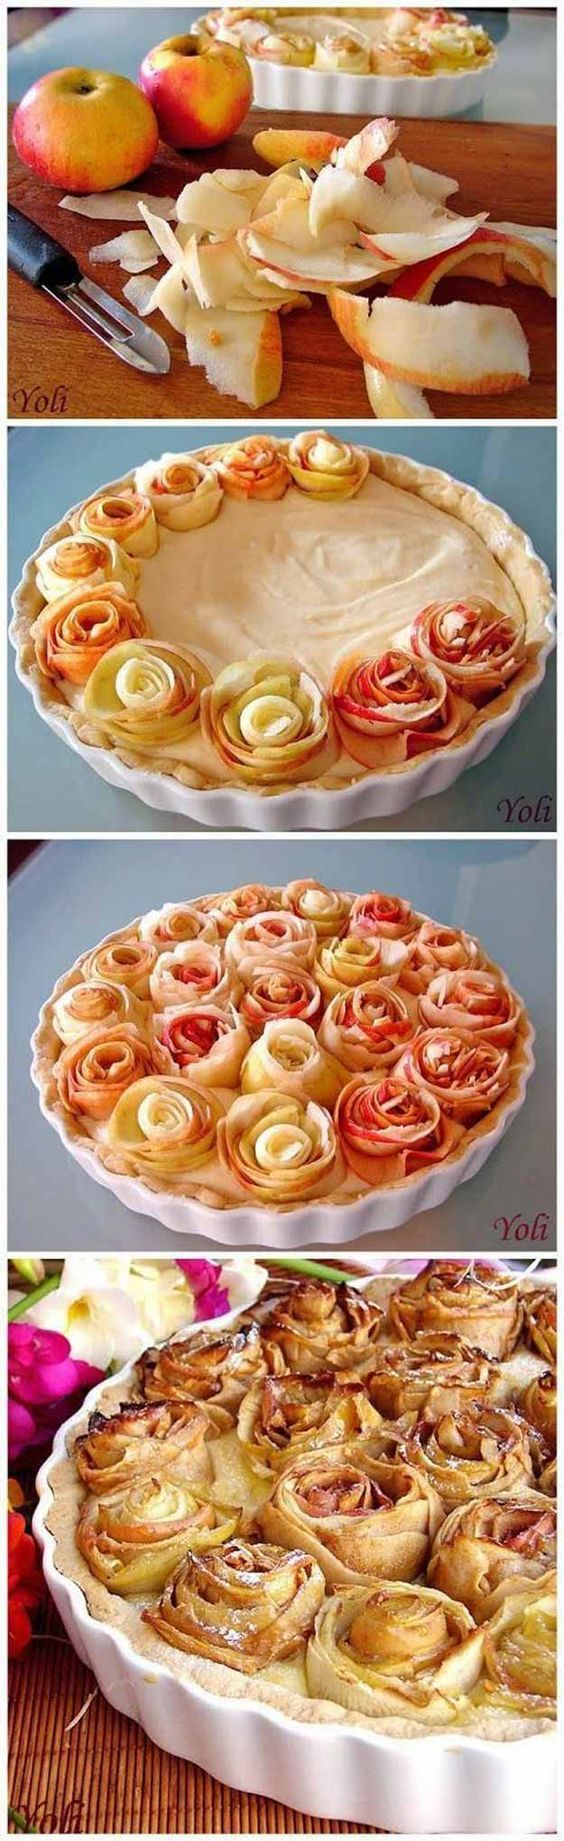 Homemade Apple Pie With Roses 10 Appetizing Apple Pie Recipe Ideas